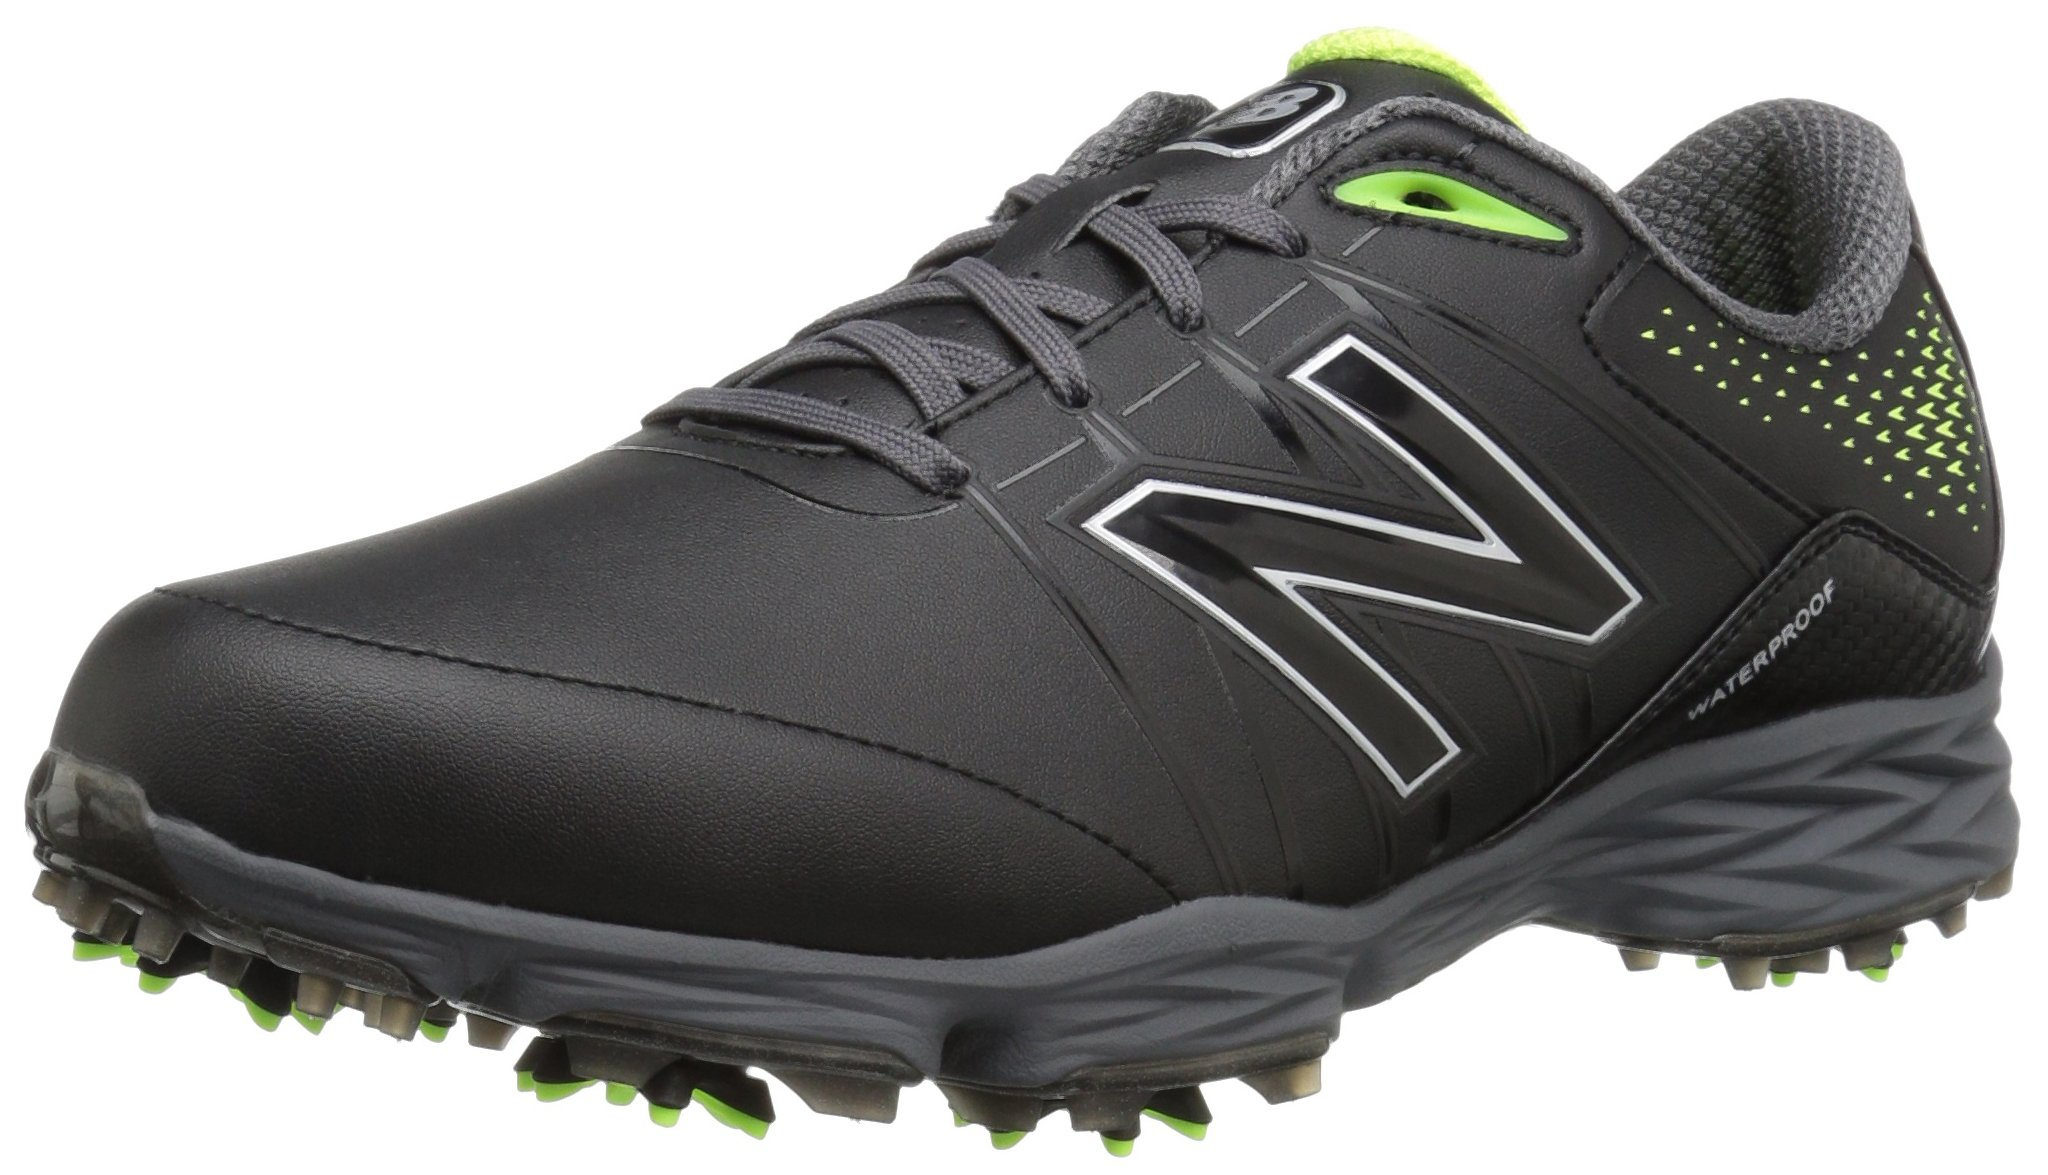 New Balance Men's nbg2004 Golf Shoe, Black/Green, 13 4E US